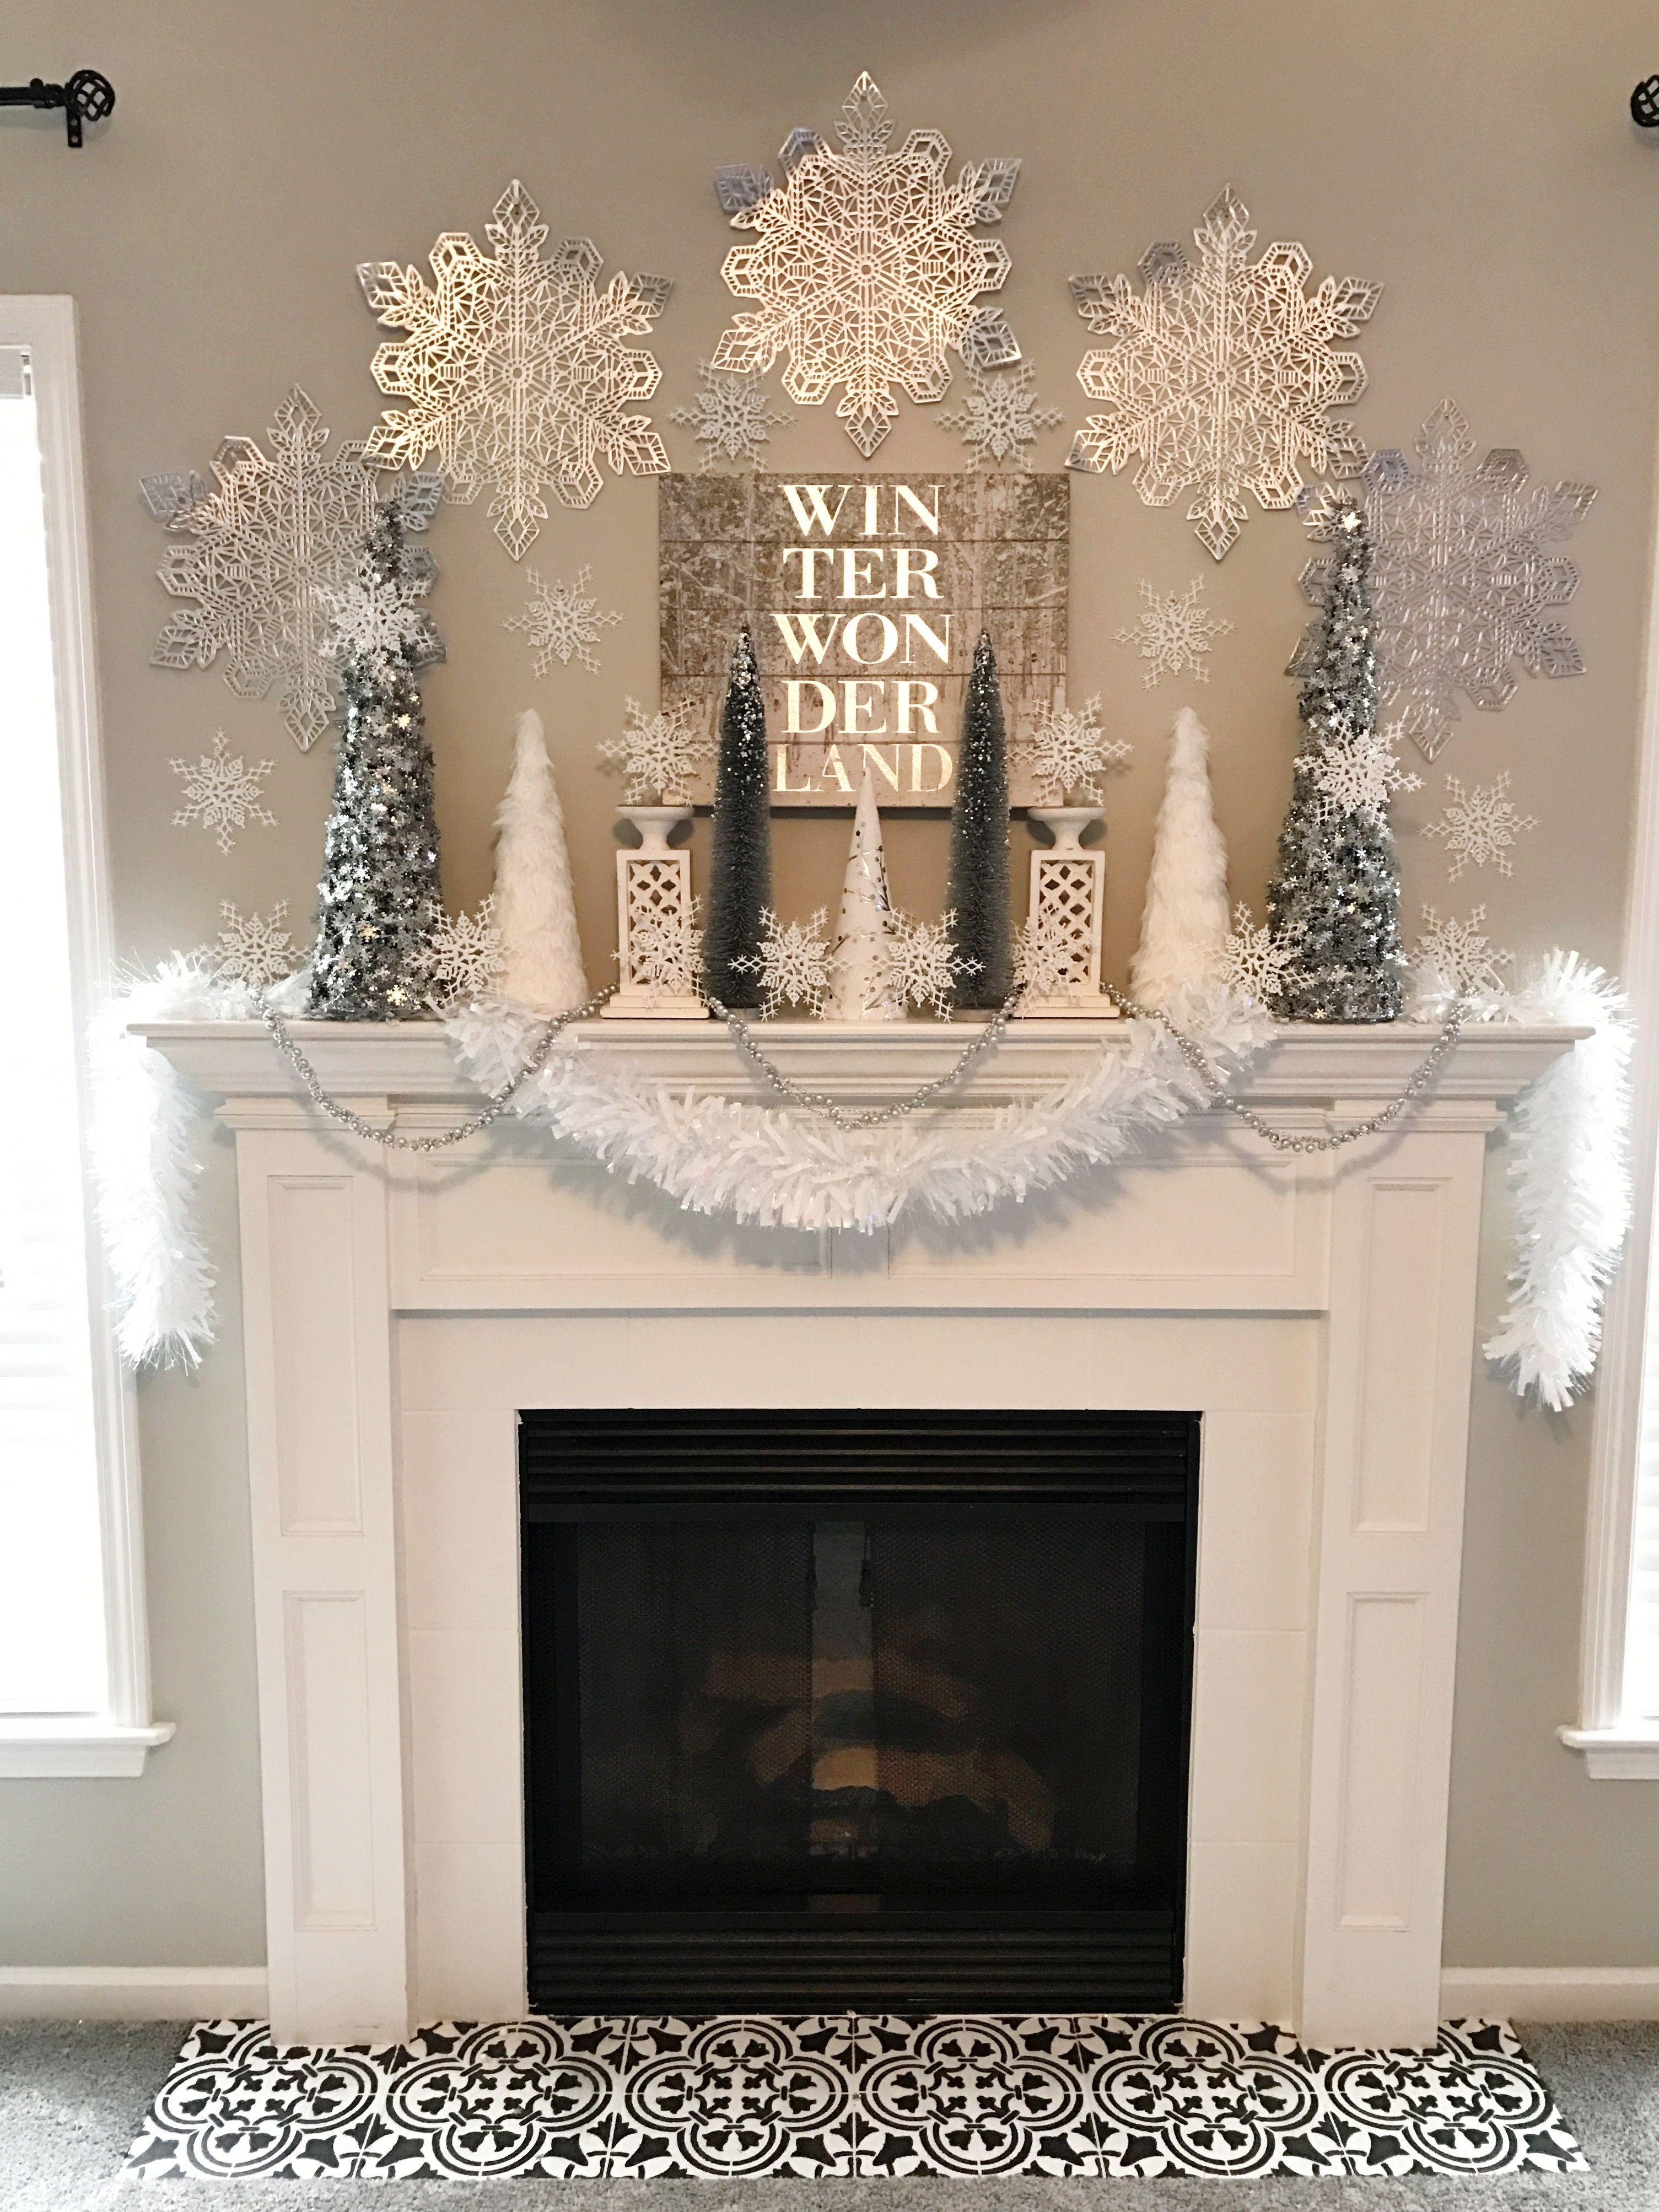 Winter Wonderland Holiday Mantel Ellery Designs Christmas Mantle Decor Christmas Mantel Decorations Holiday Mantel